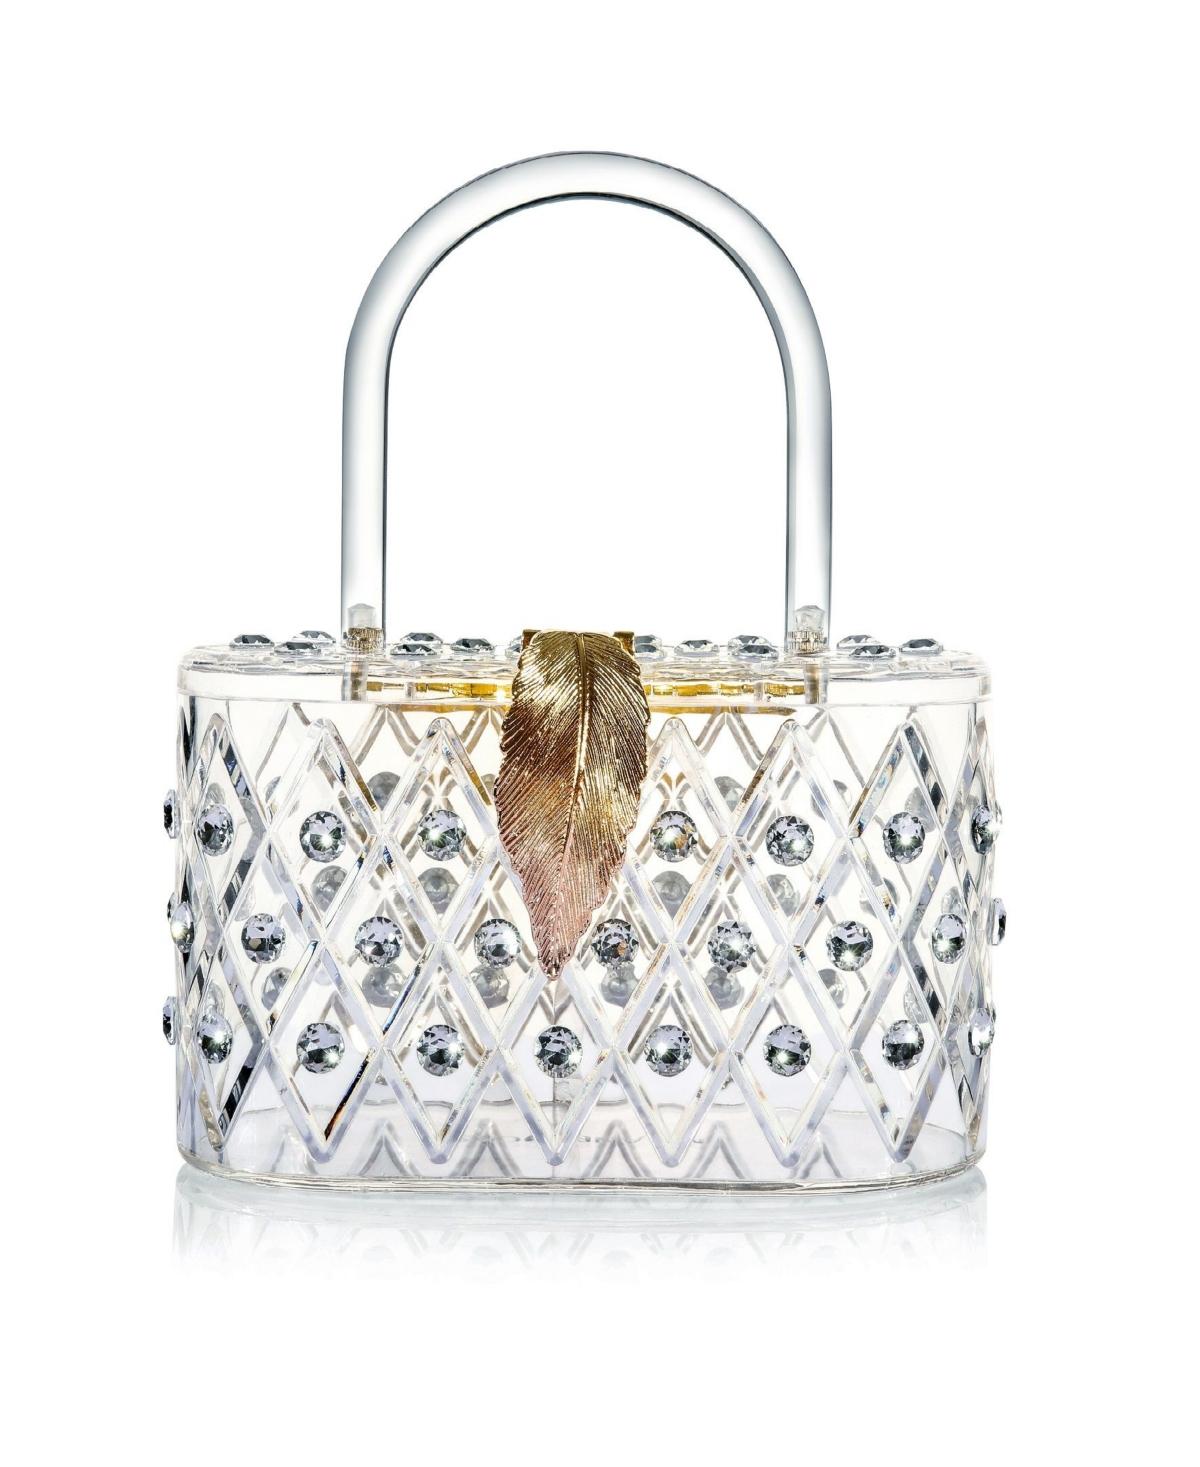 "Milanblocks ""The Princess"" 50's Style Top Handle Crystal Box Clutch Handbag"